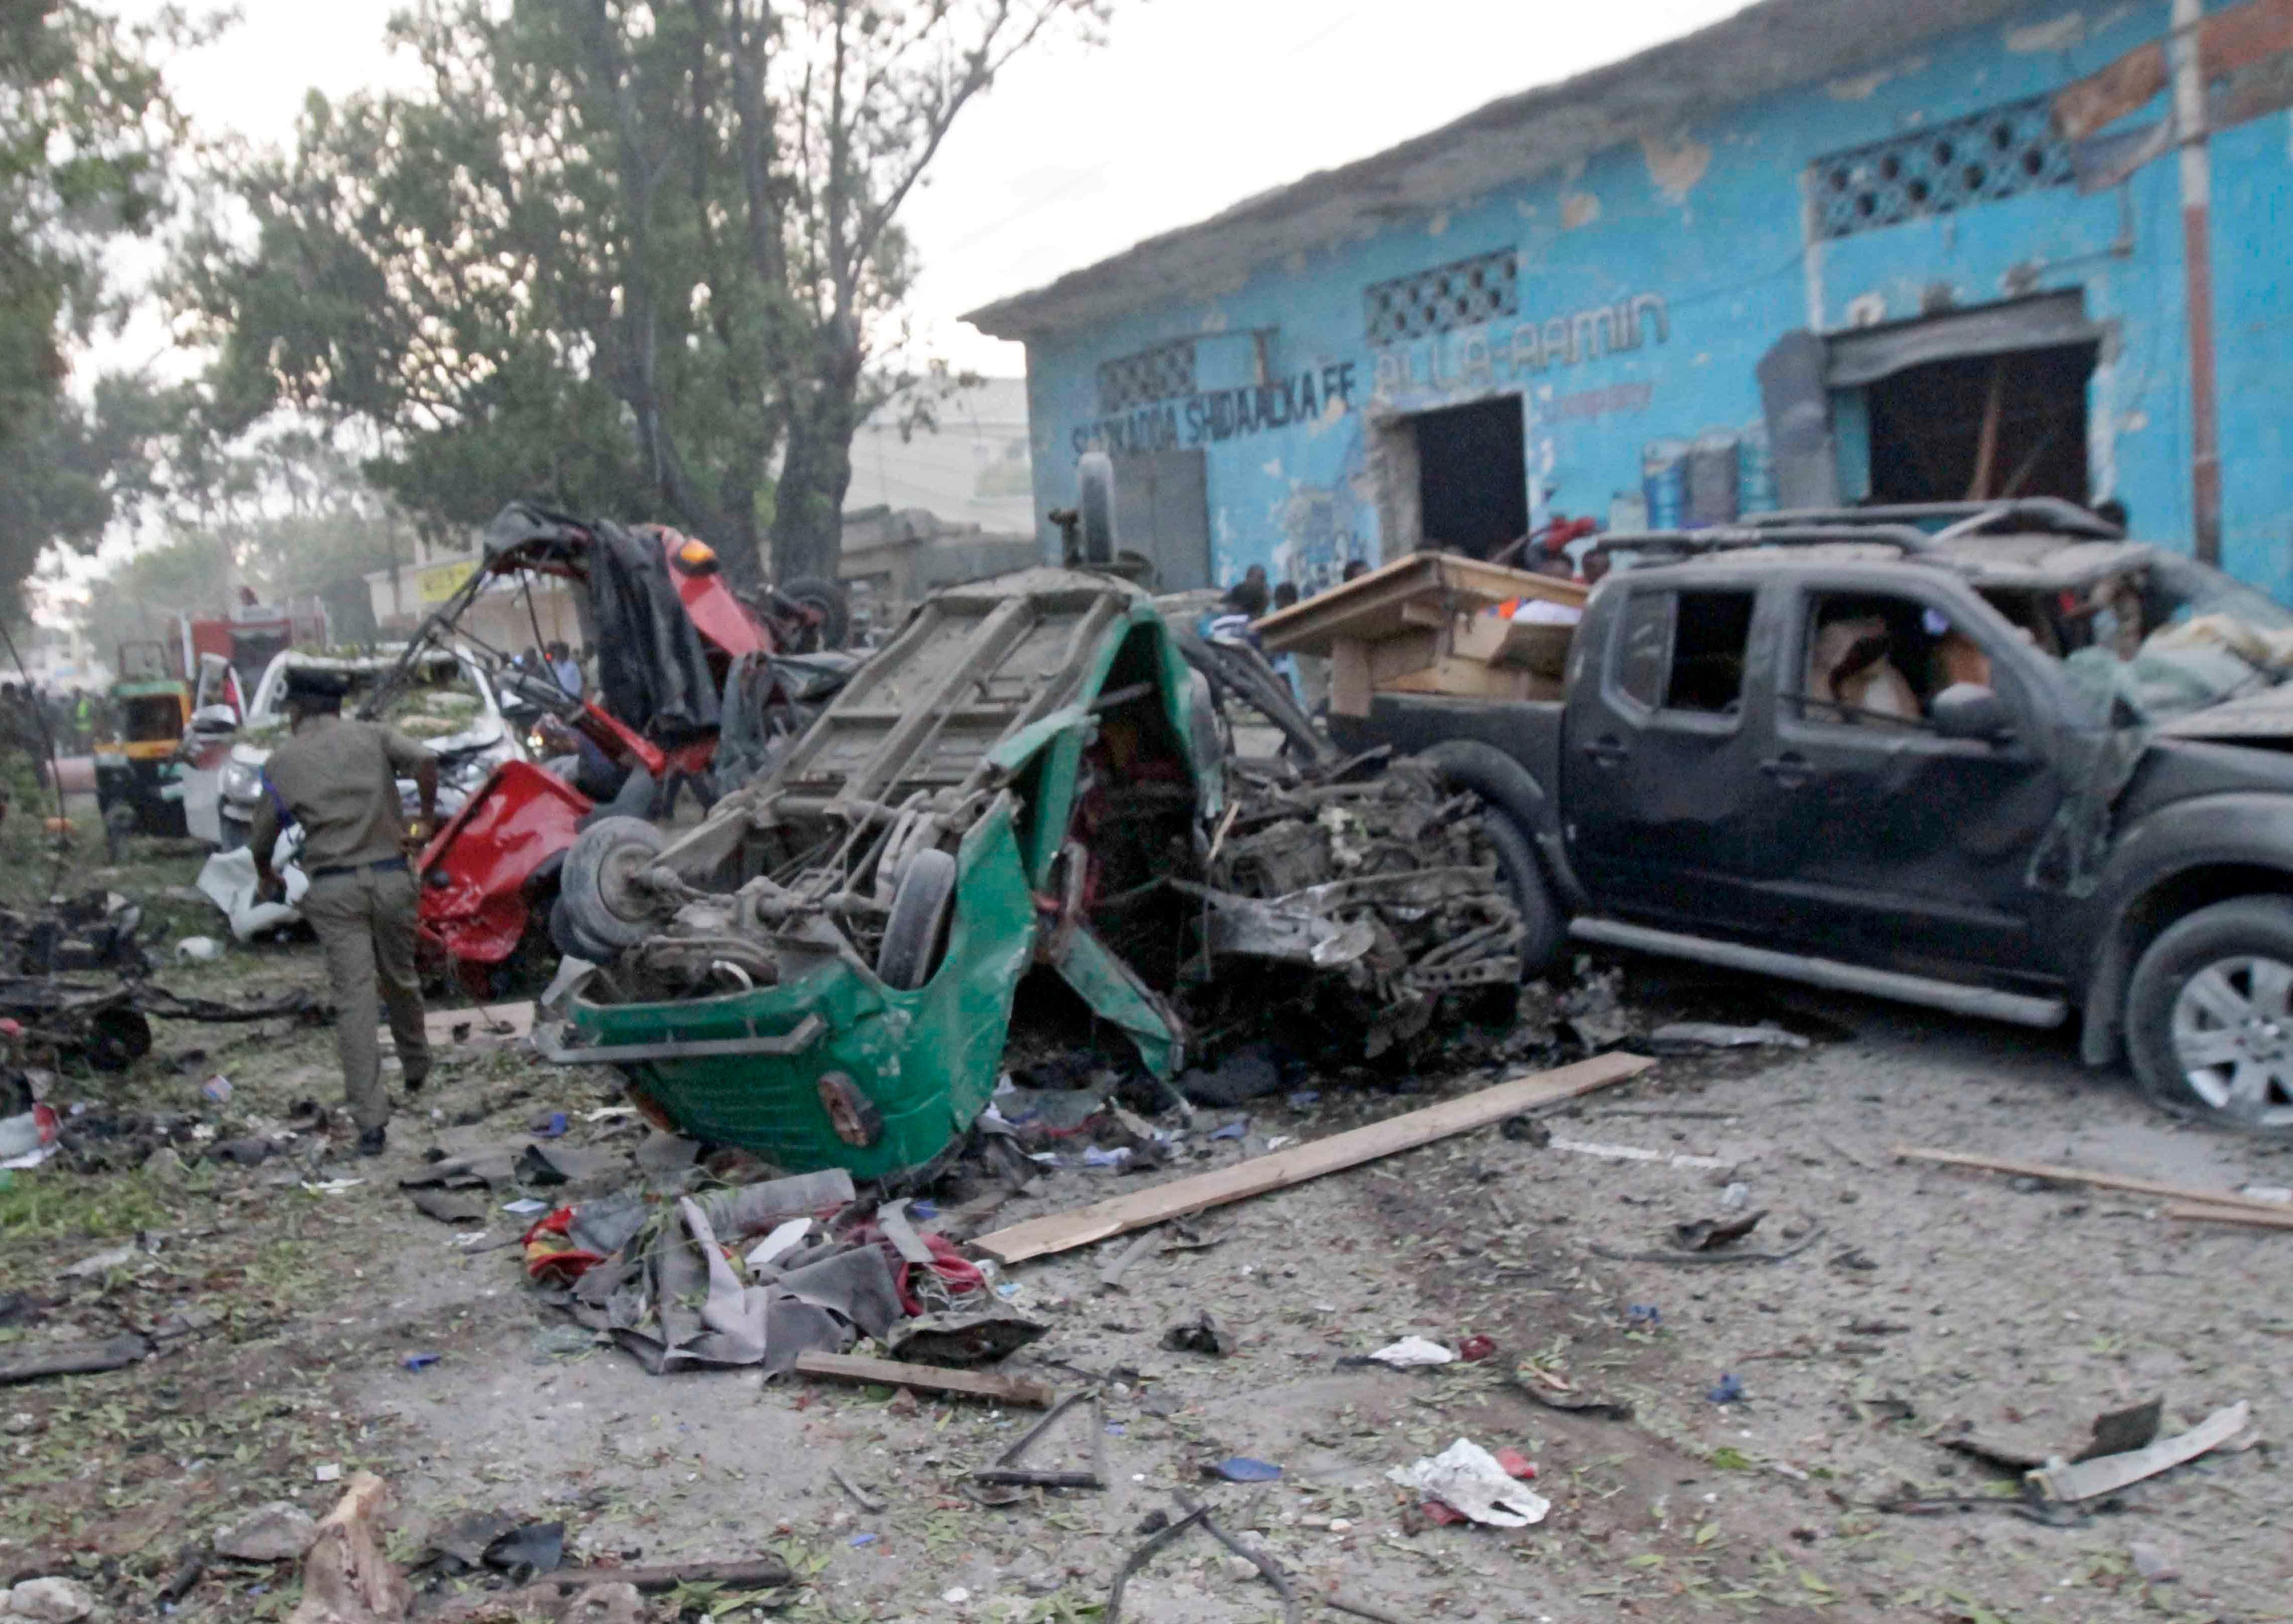 636448044569275328-EPA-epaselect-SOMALIA-SUICIDE-ATTACK-MOGADISHU.jpg